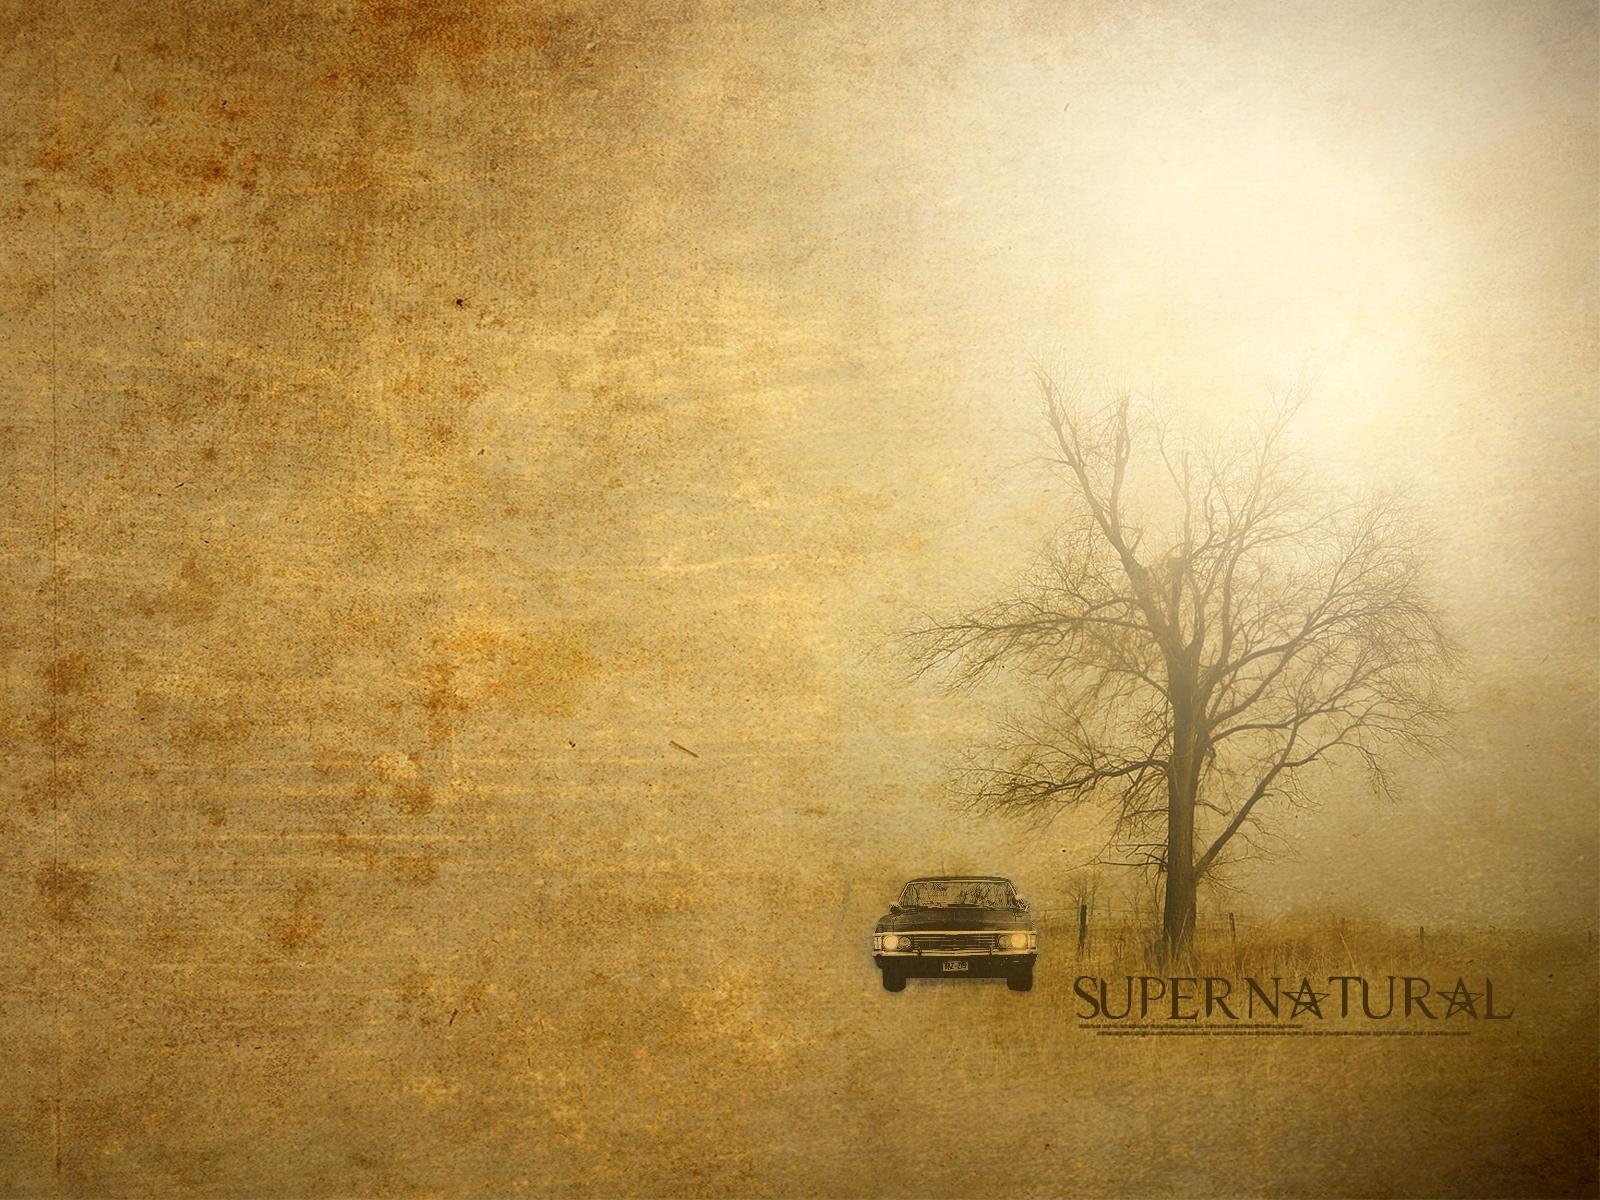 Impala-supernatural-6688270-1600-1200